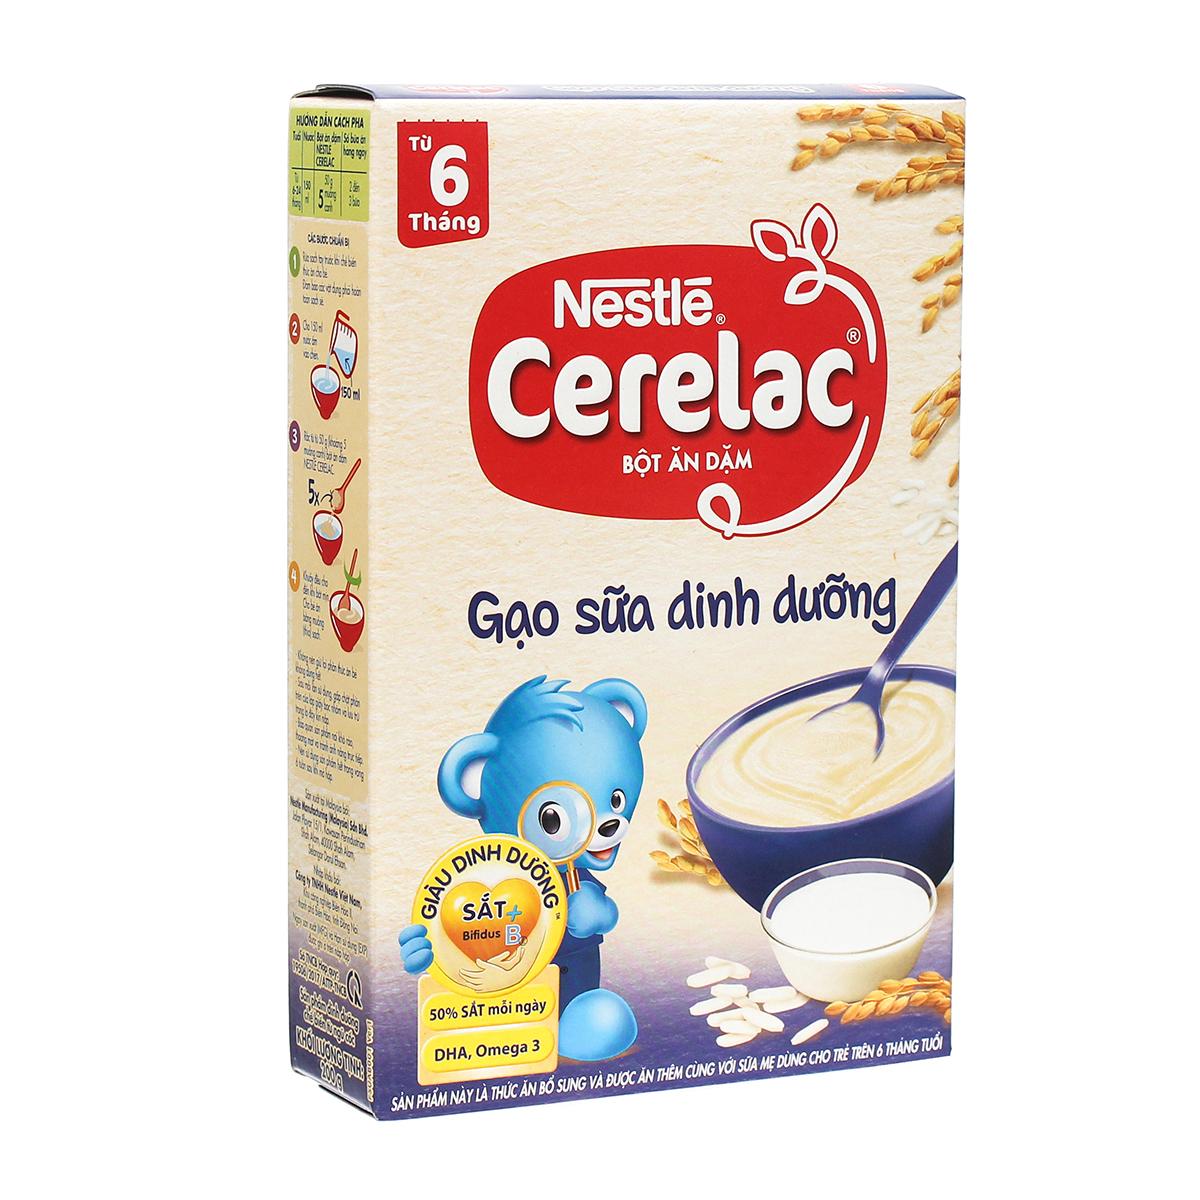 Bột ăn dặm Nestle Cerelac gạo sữa 200g